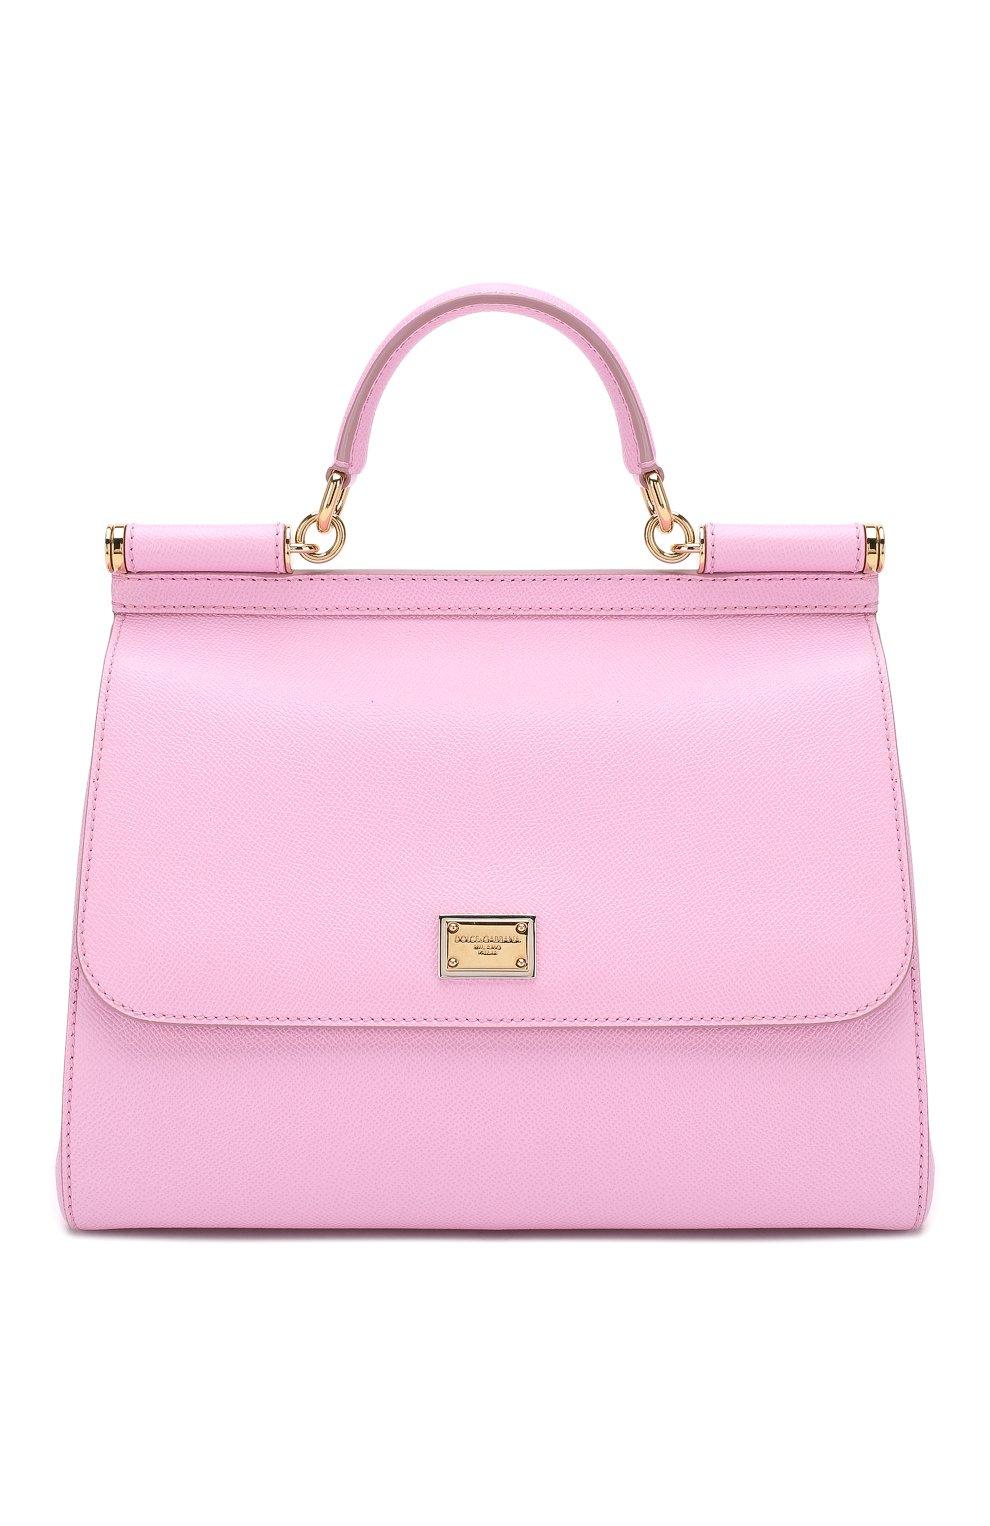 01d75e01141c Женская сумка sicily medium new DOLCE & GABBANA розовая цвета ...